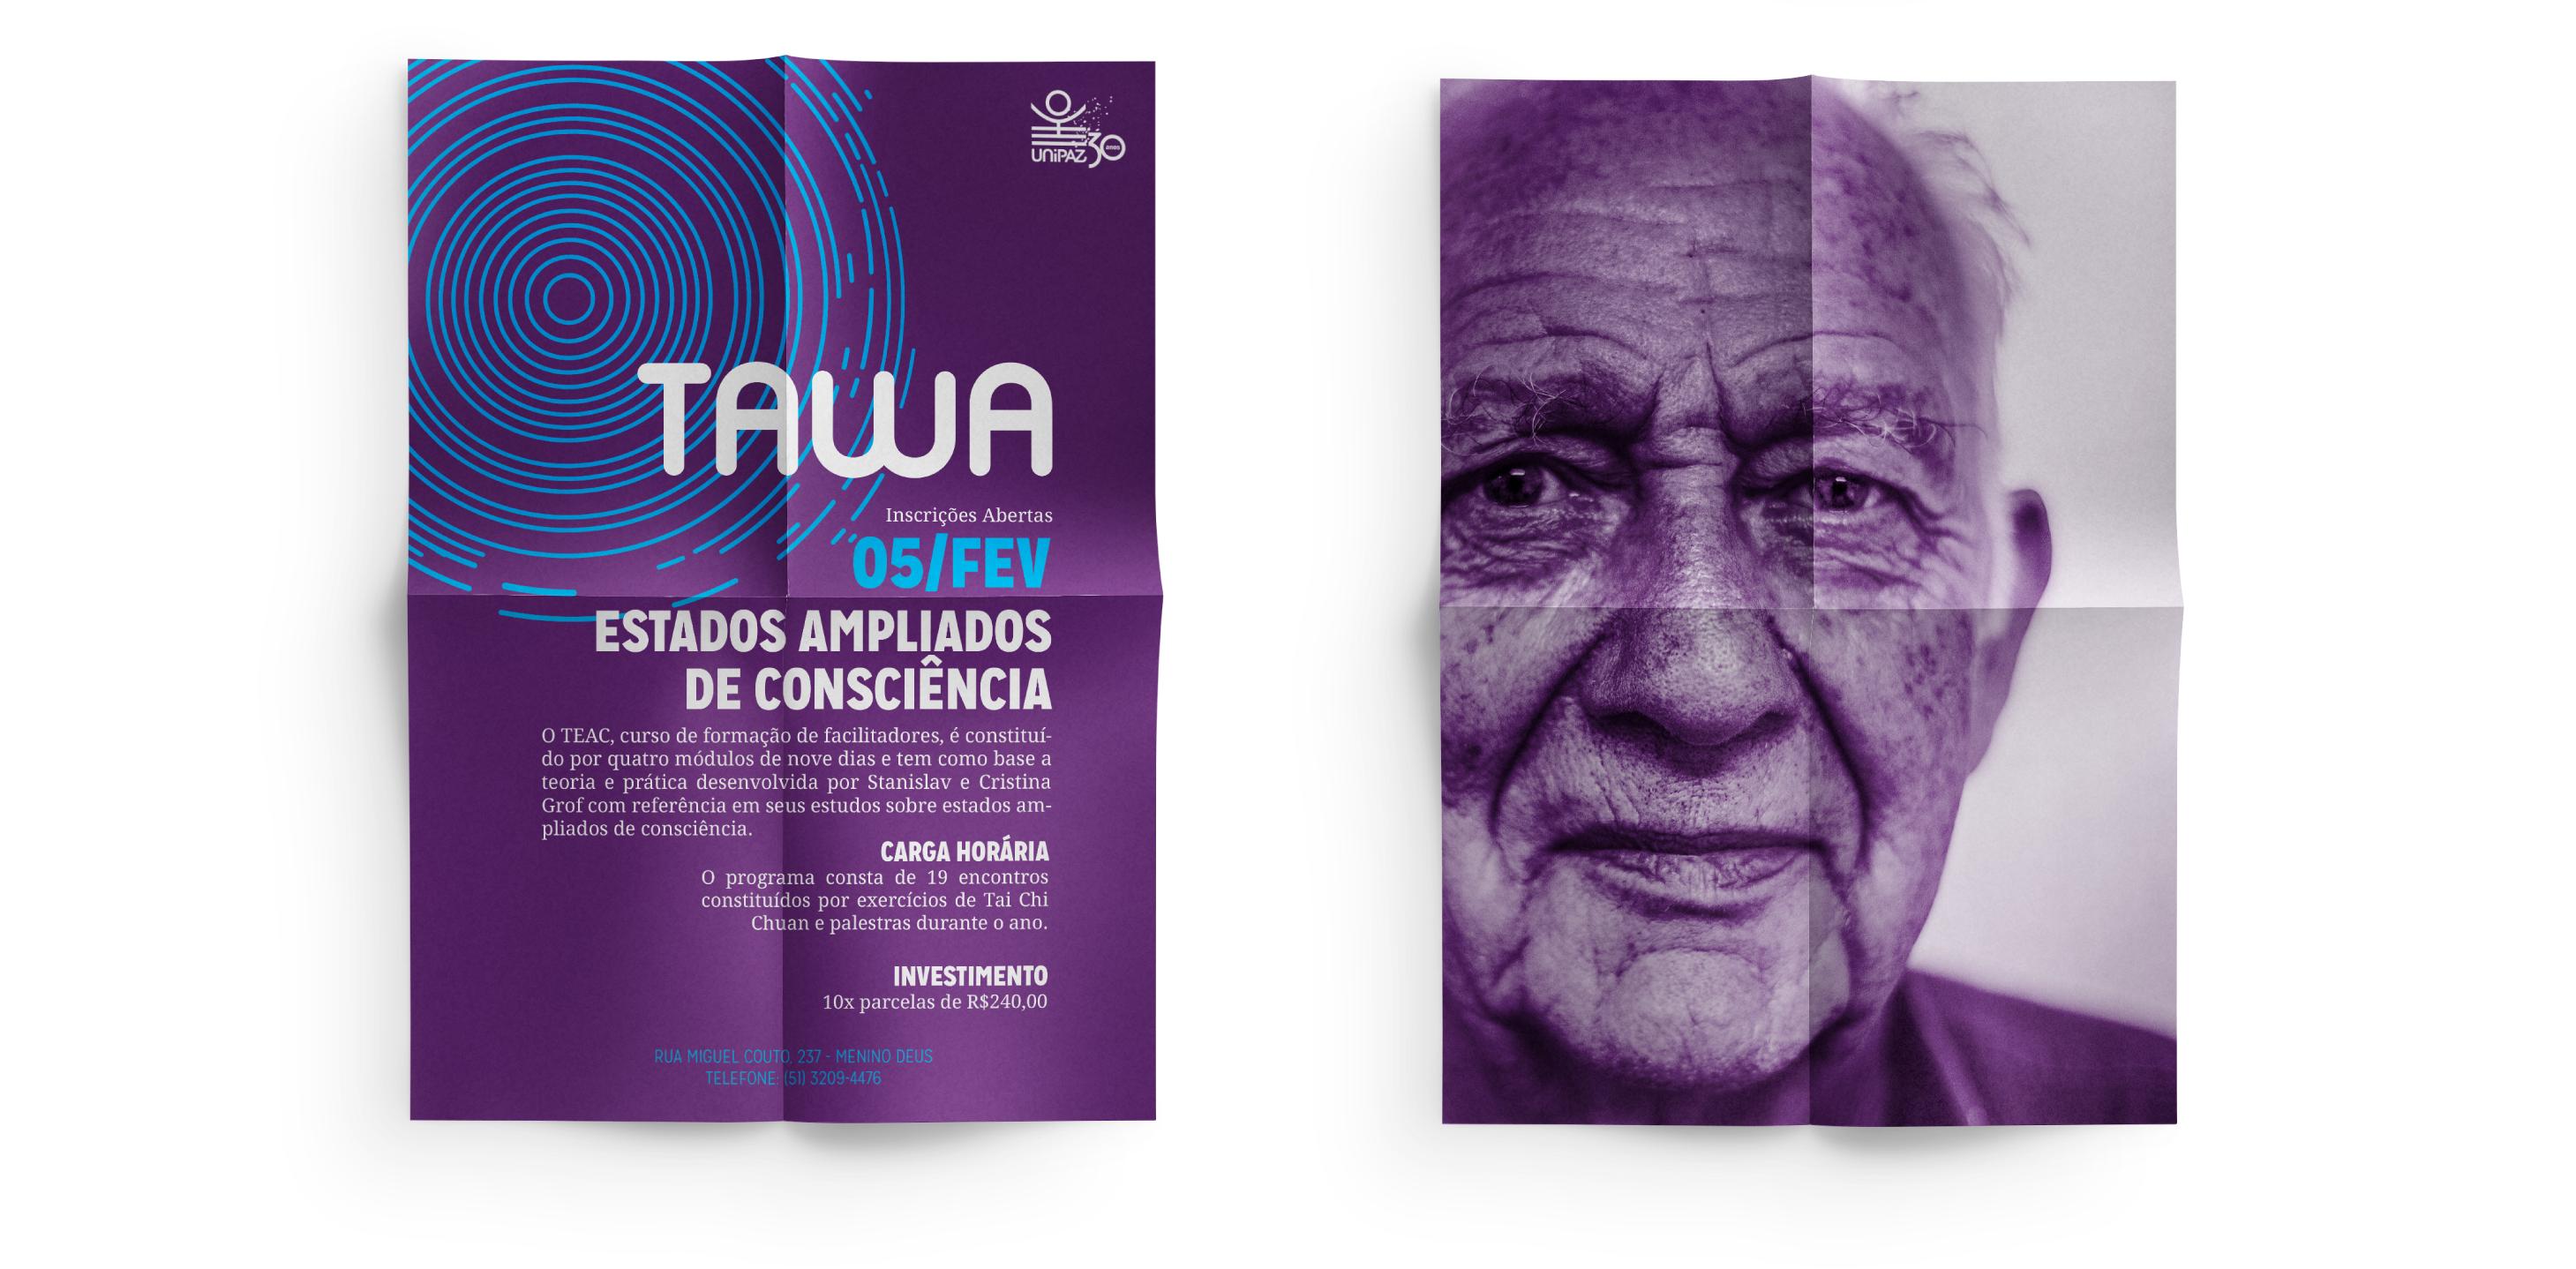 Identidade Visual Tawa Abio Design Lab - Transmuta